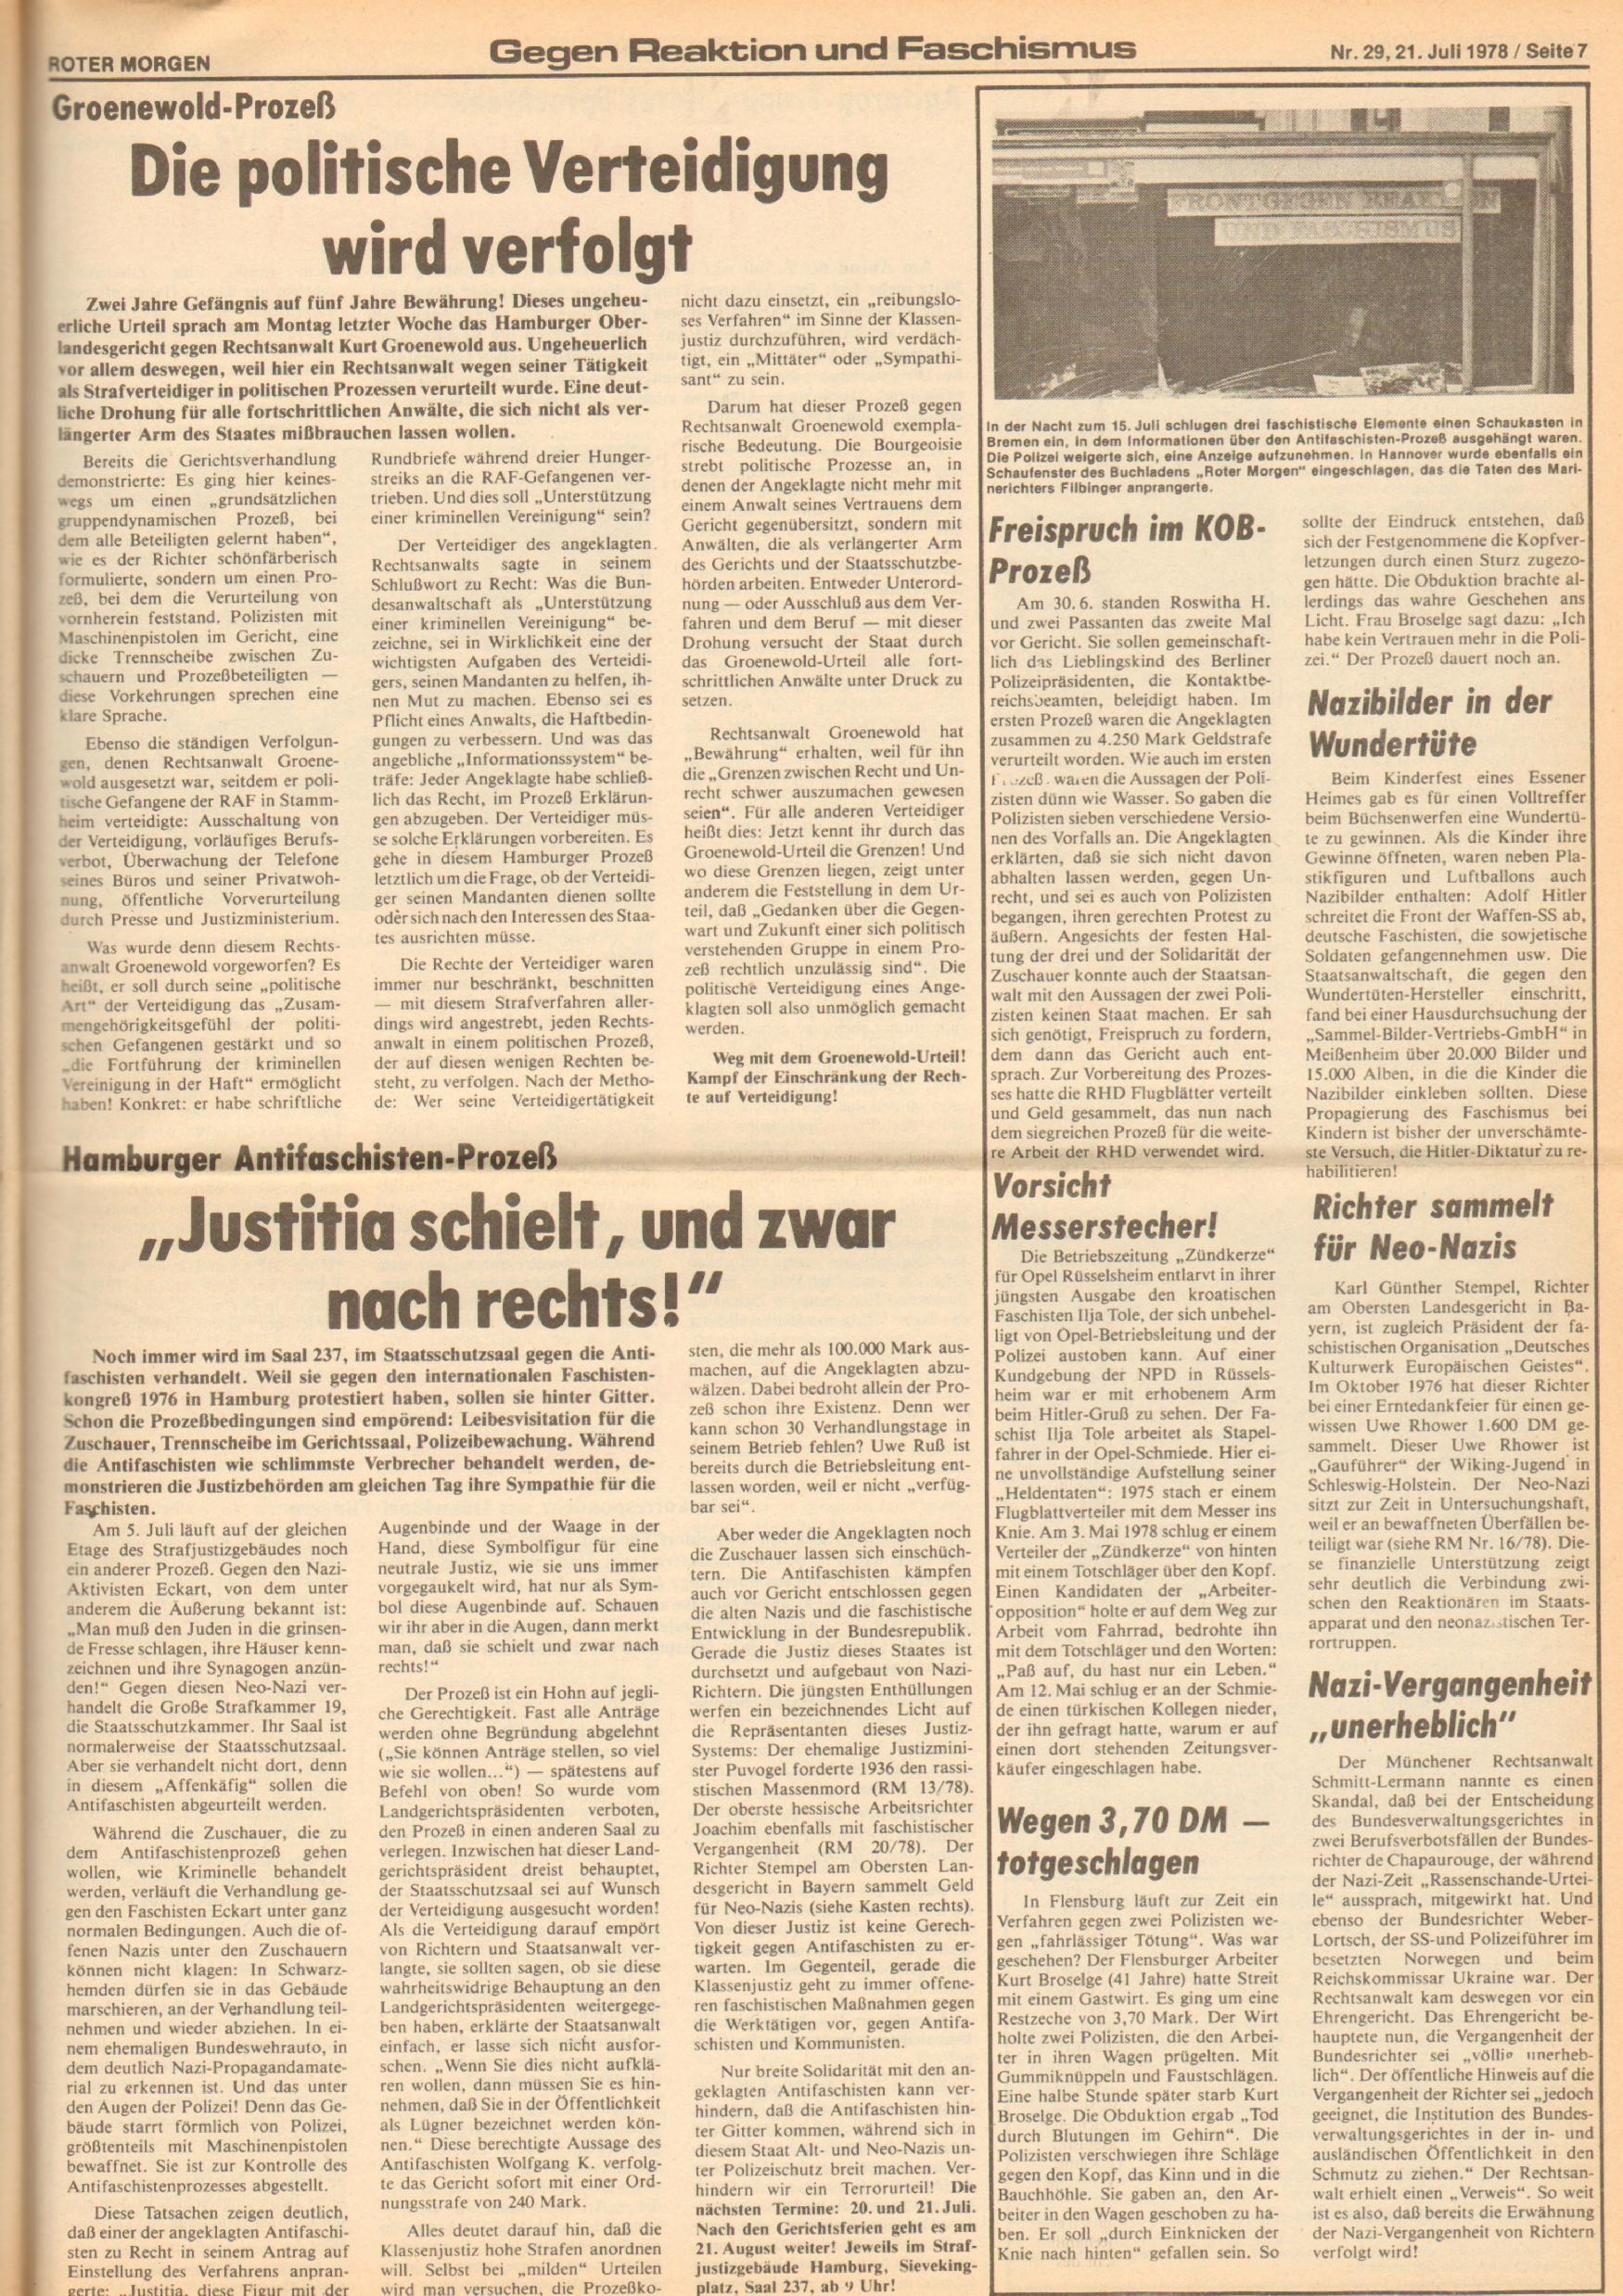 Roter Morgen, 12. Jg., 21. Juli 1978, Nr. 29, Seite 7